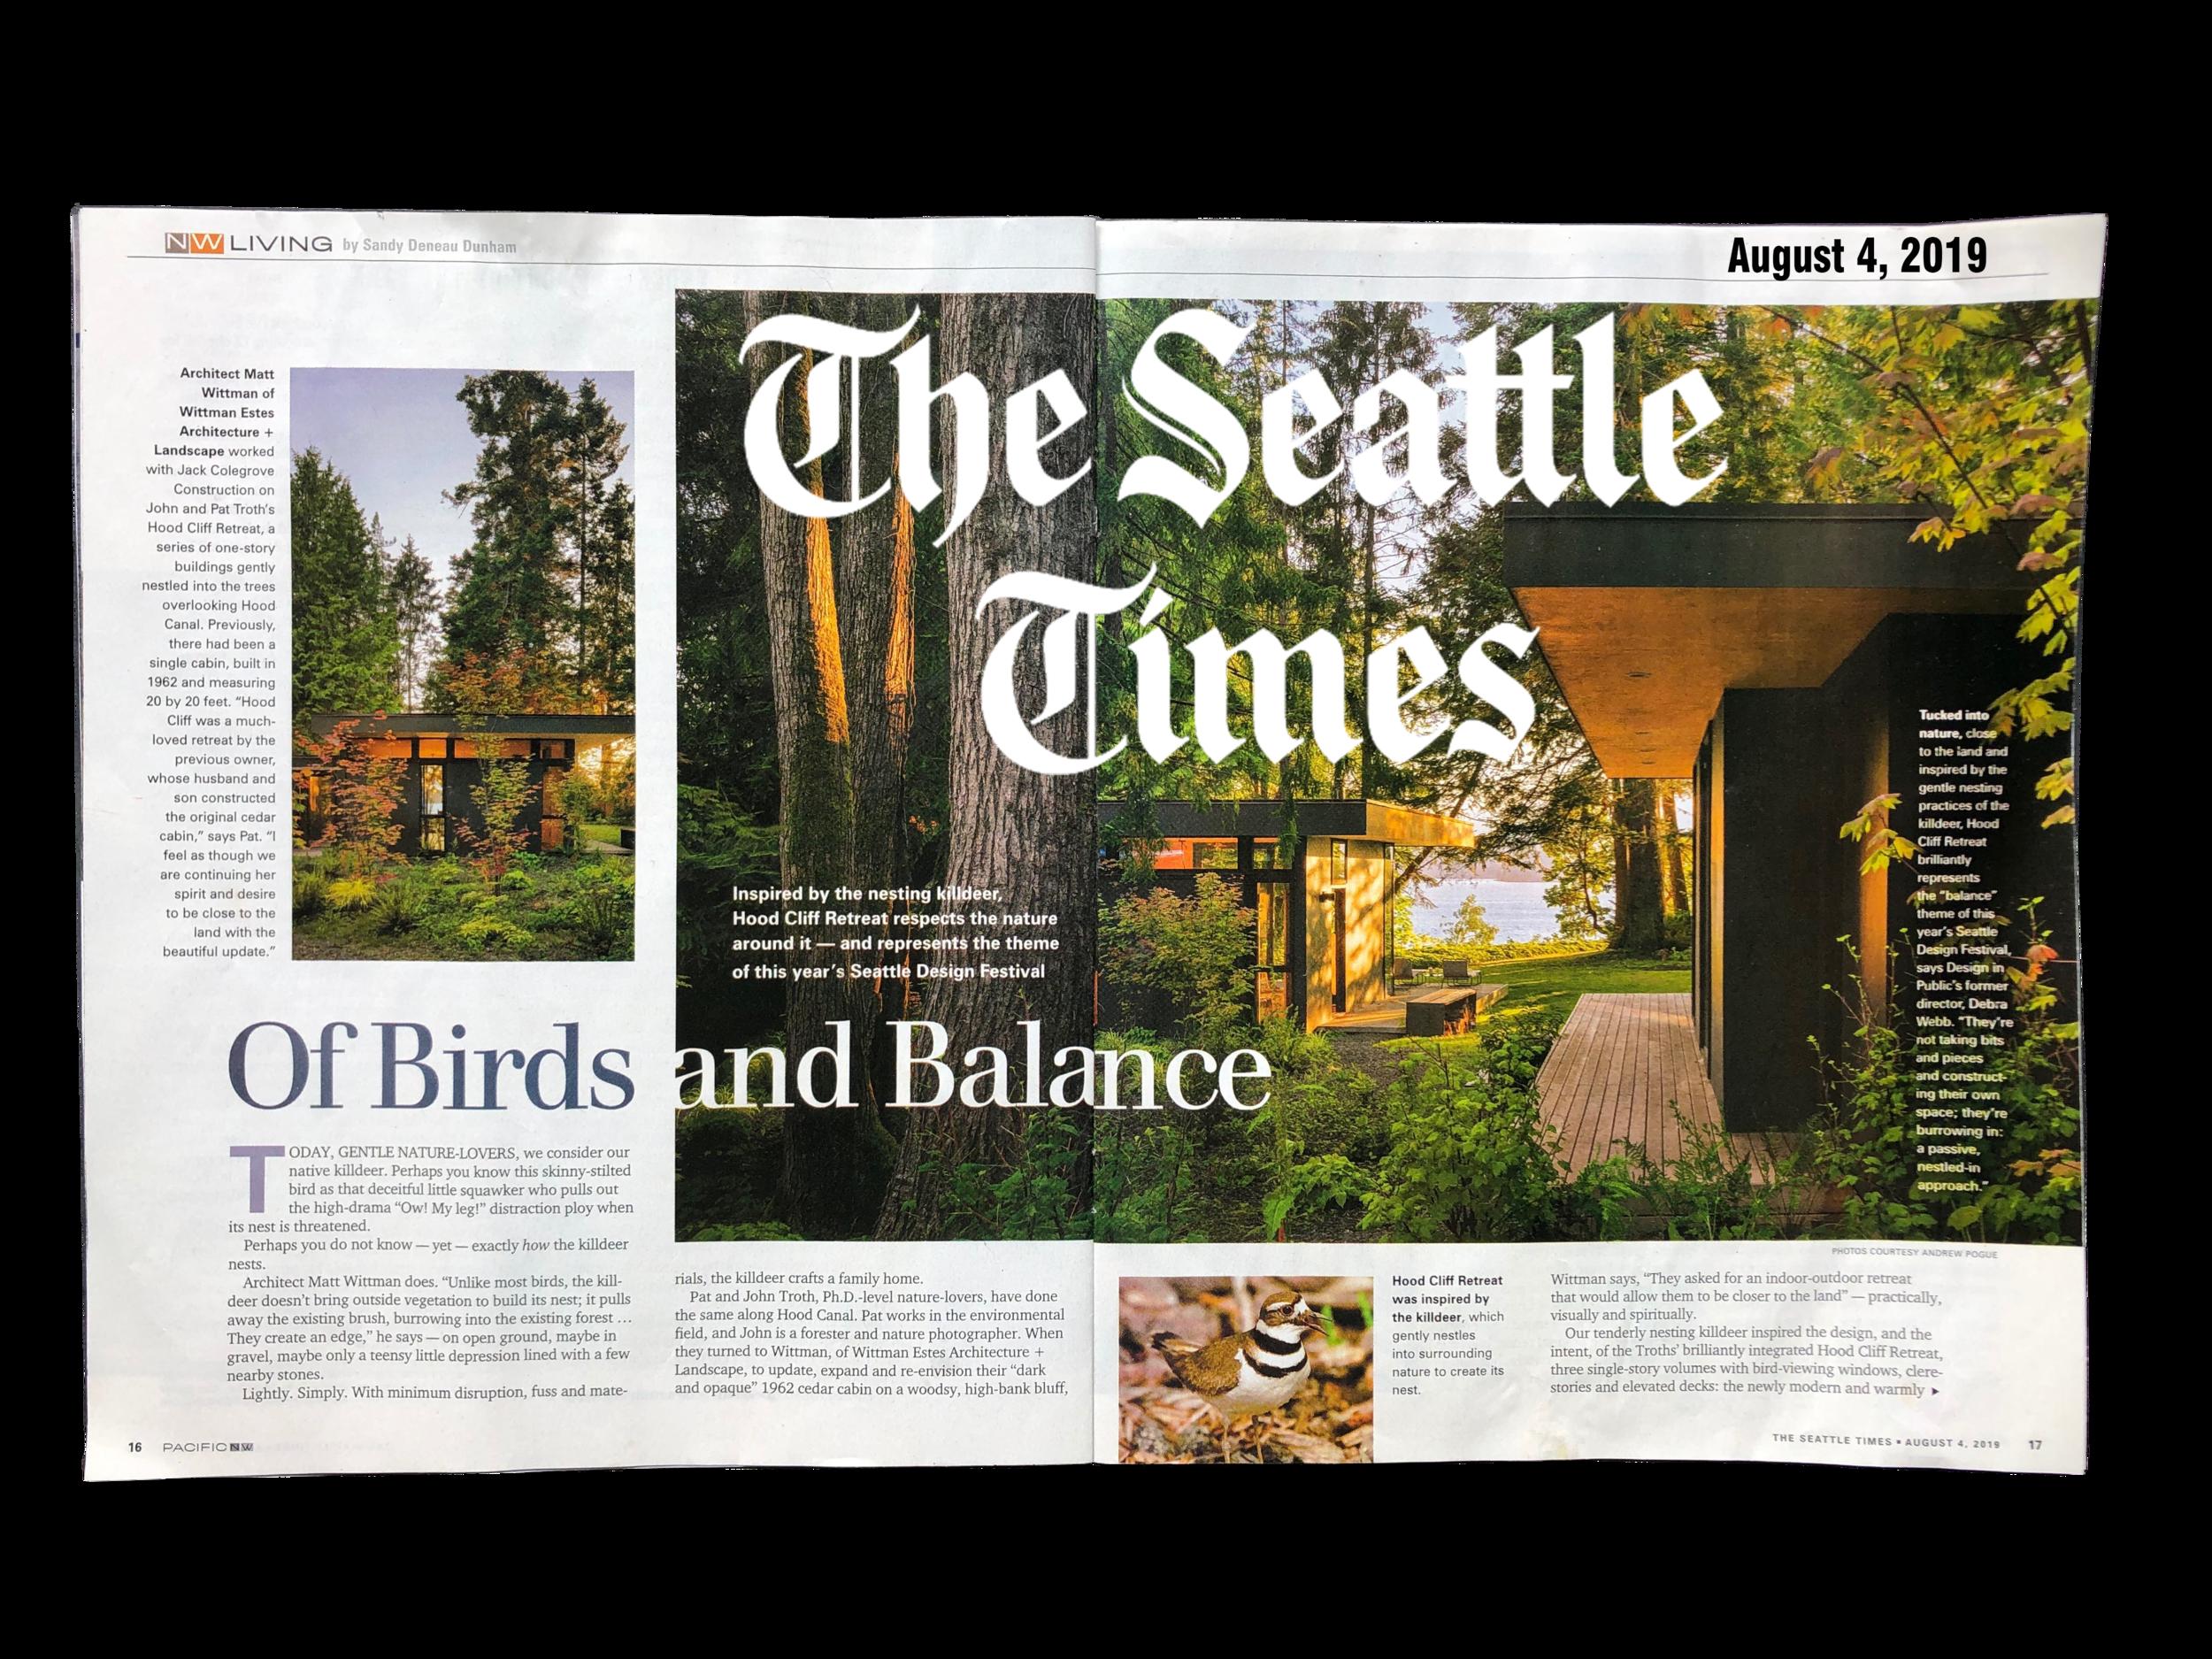 Hood Cliff_Seattle Times_landing page.jpg